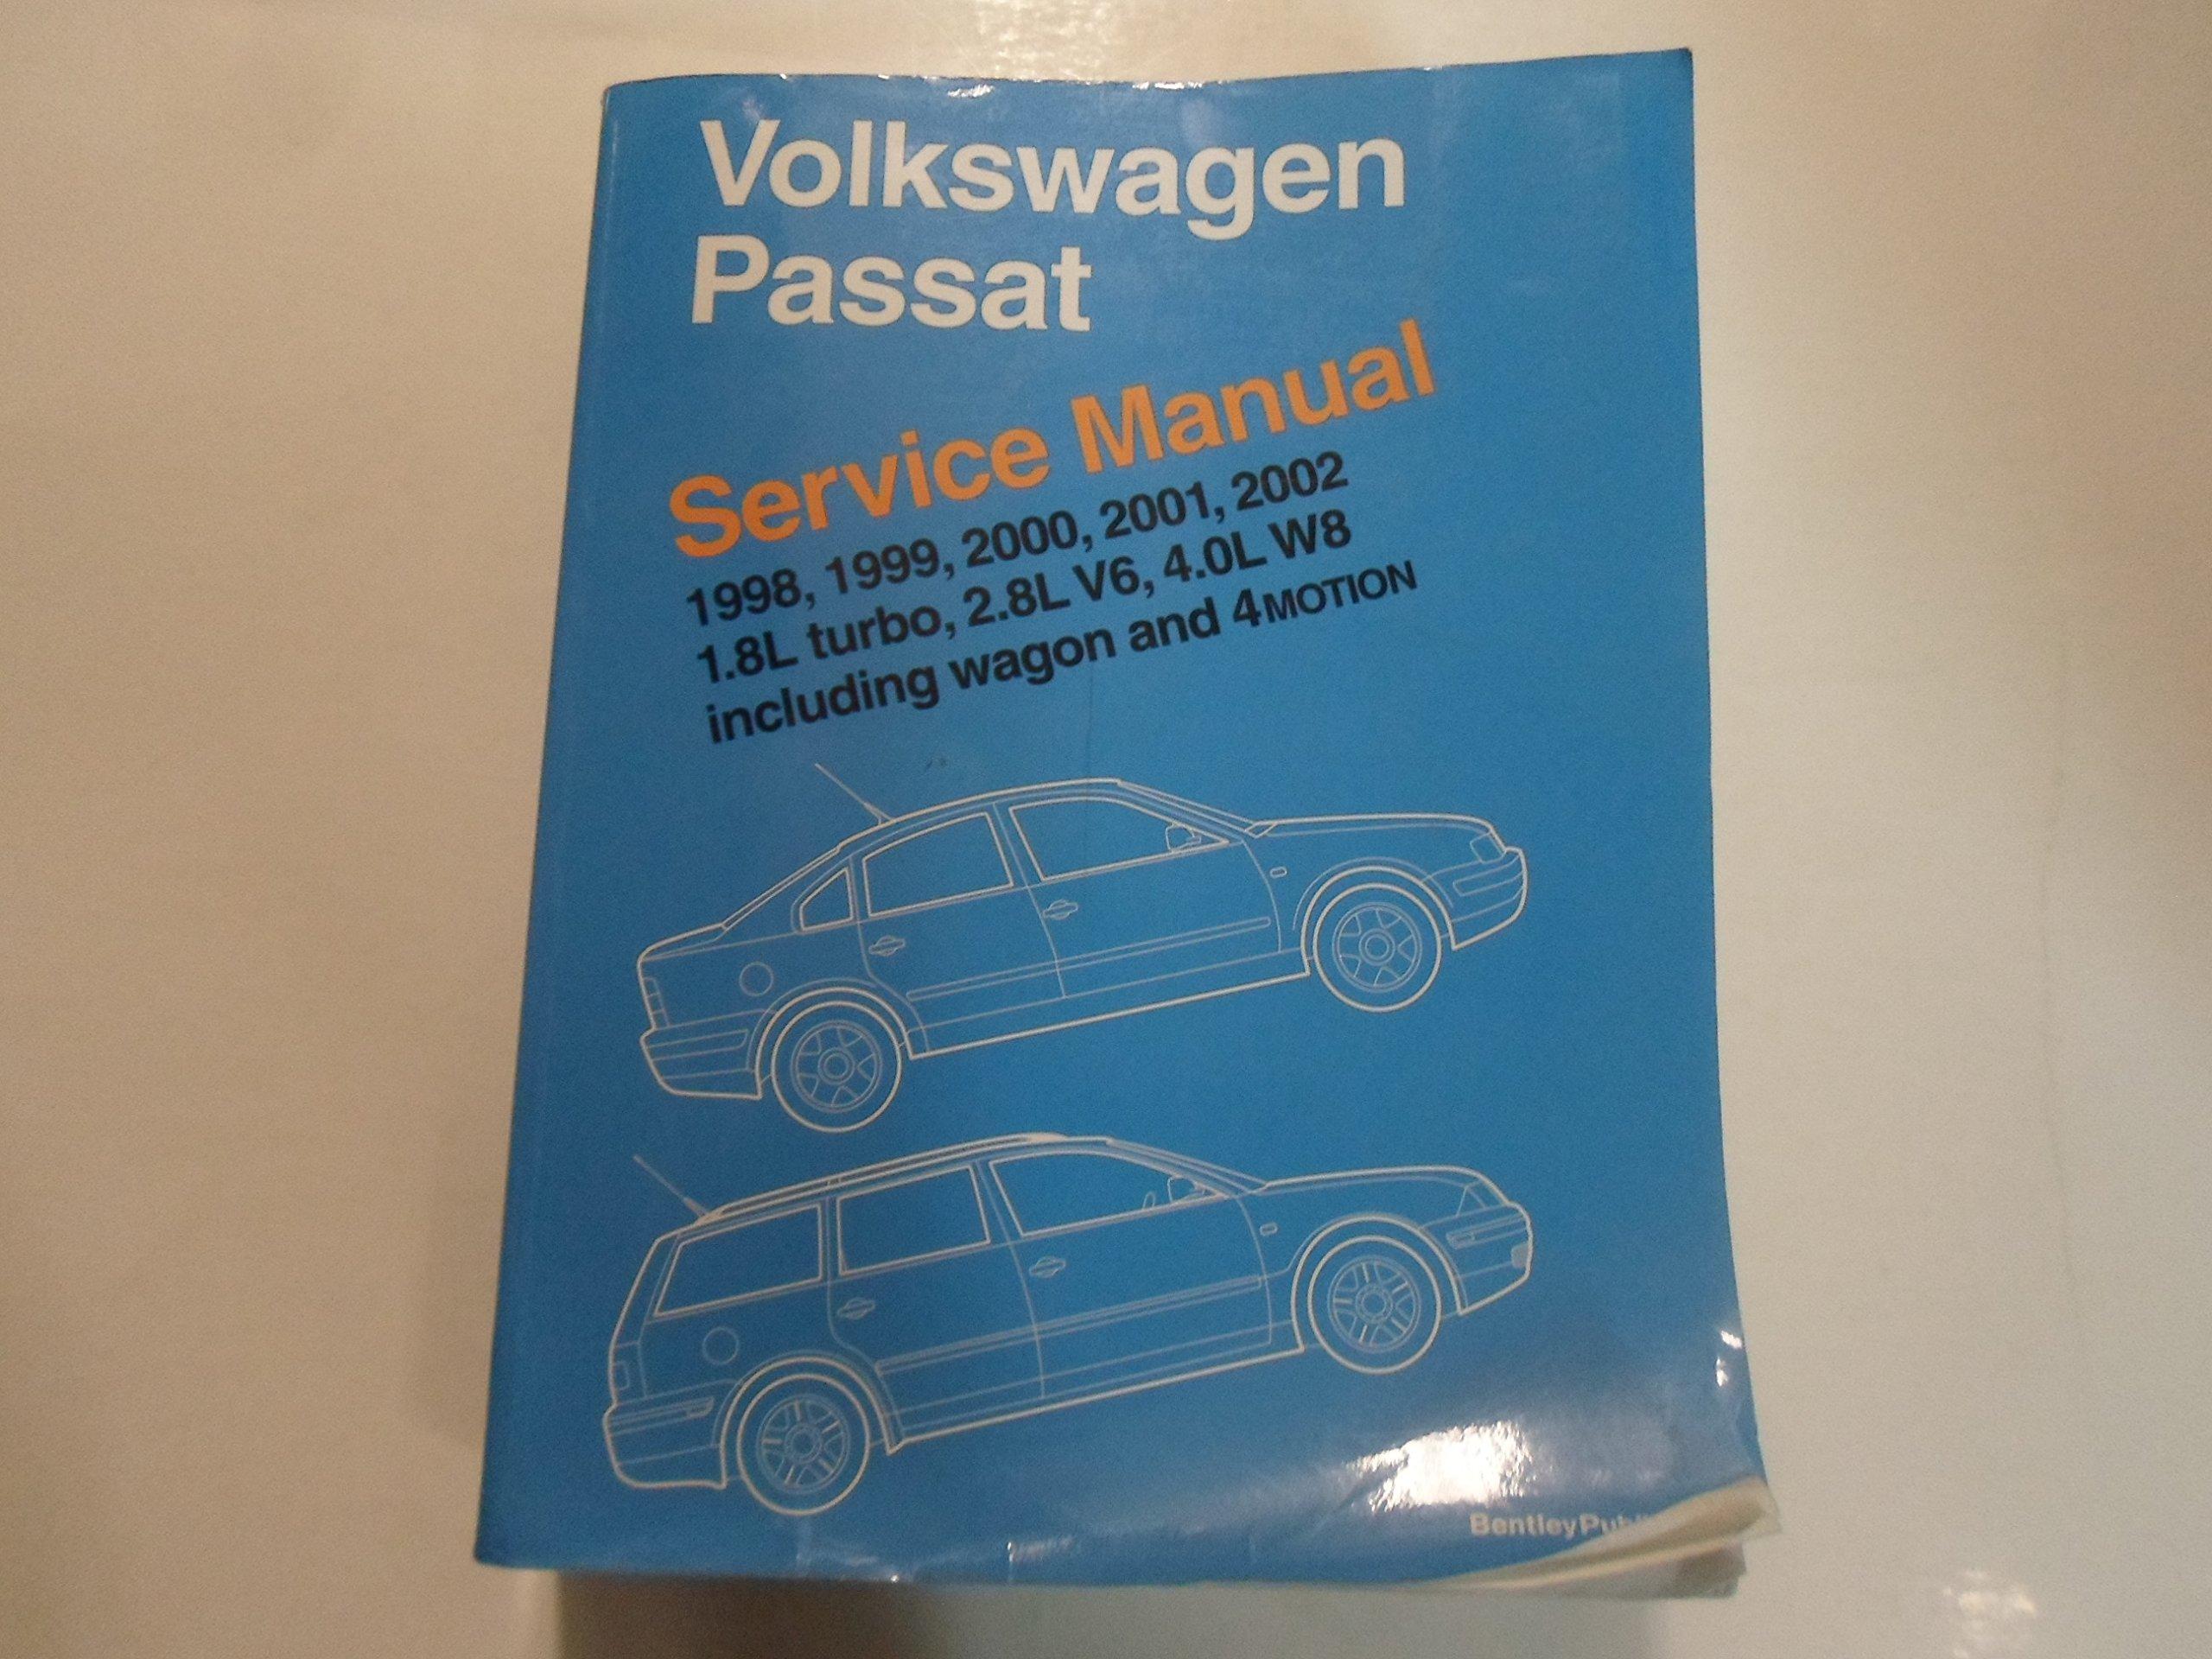 1998 2002 VW Passat 1.8L 2.8L V6 4.0L W8 Service Repair Manual MINOR WEAR:  Volkswagen: Amazon.com: Books